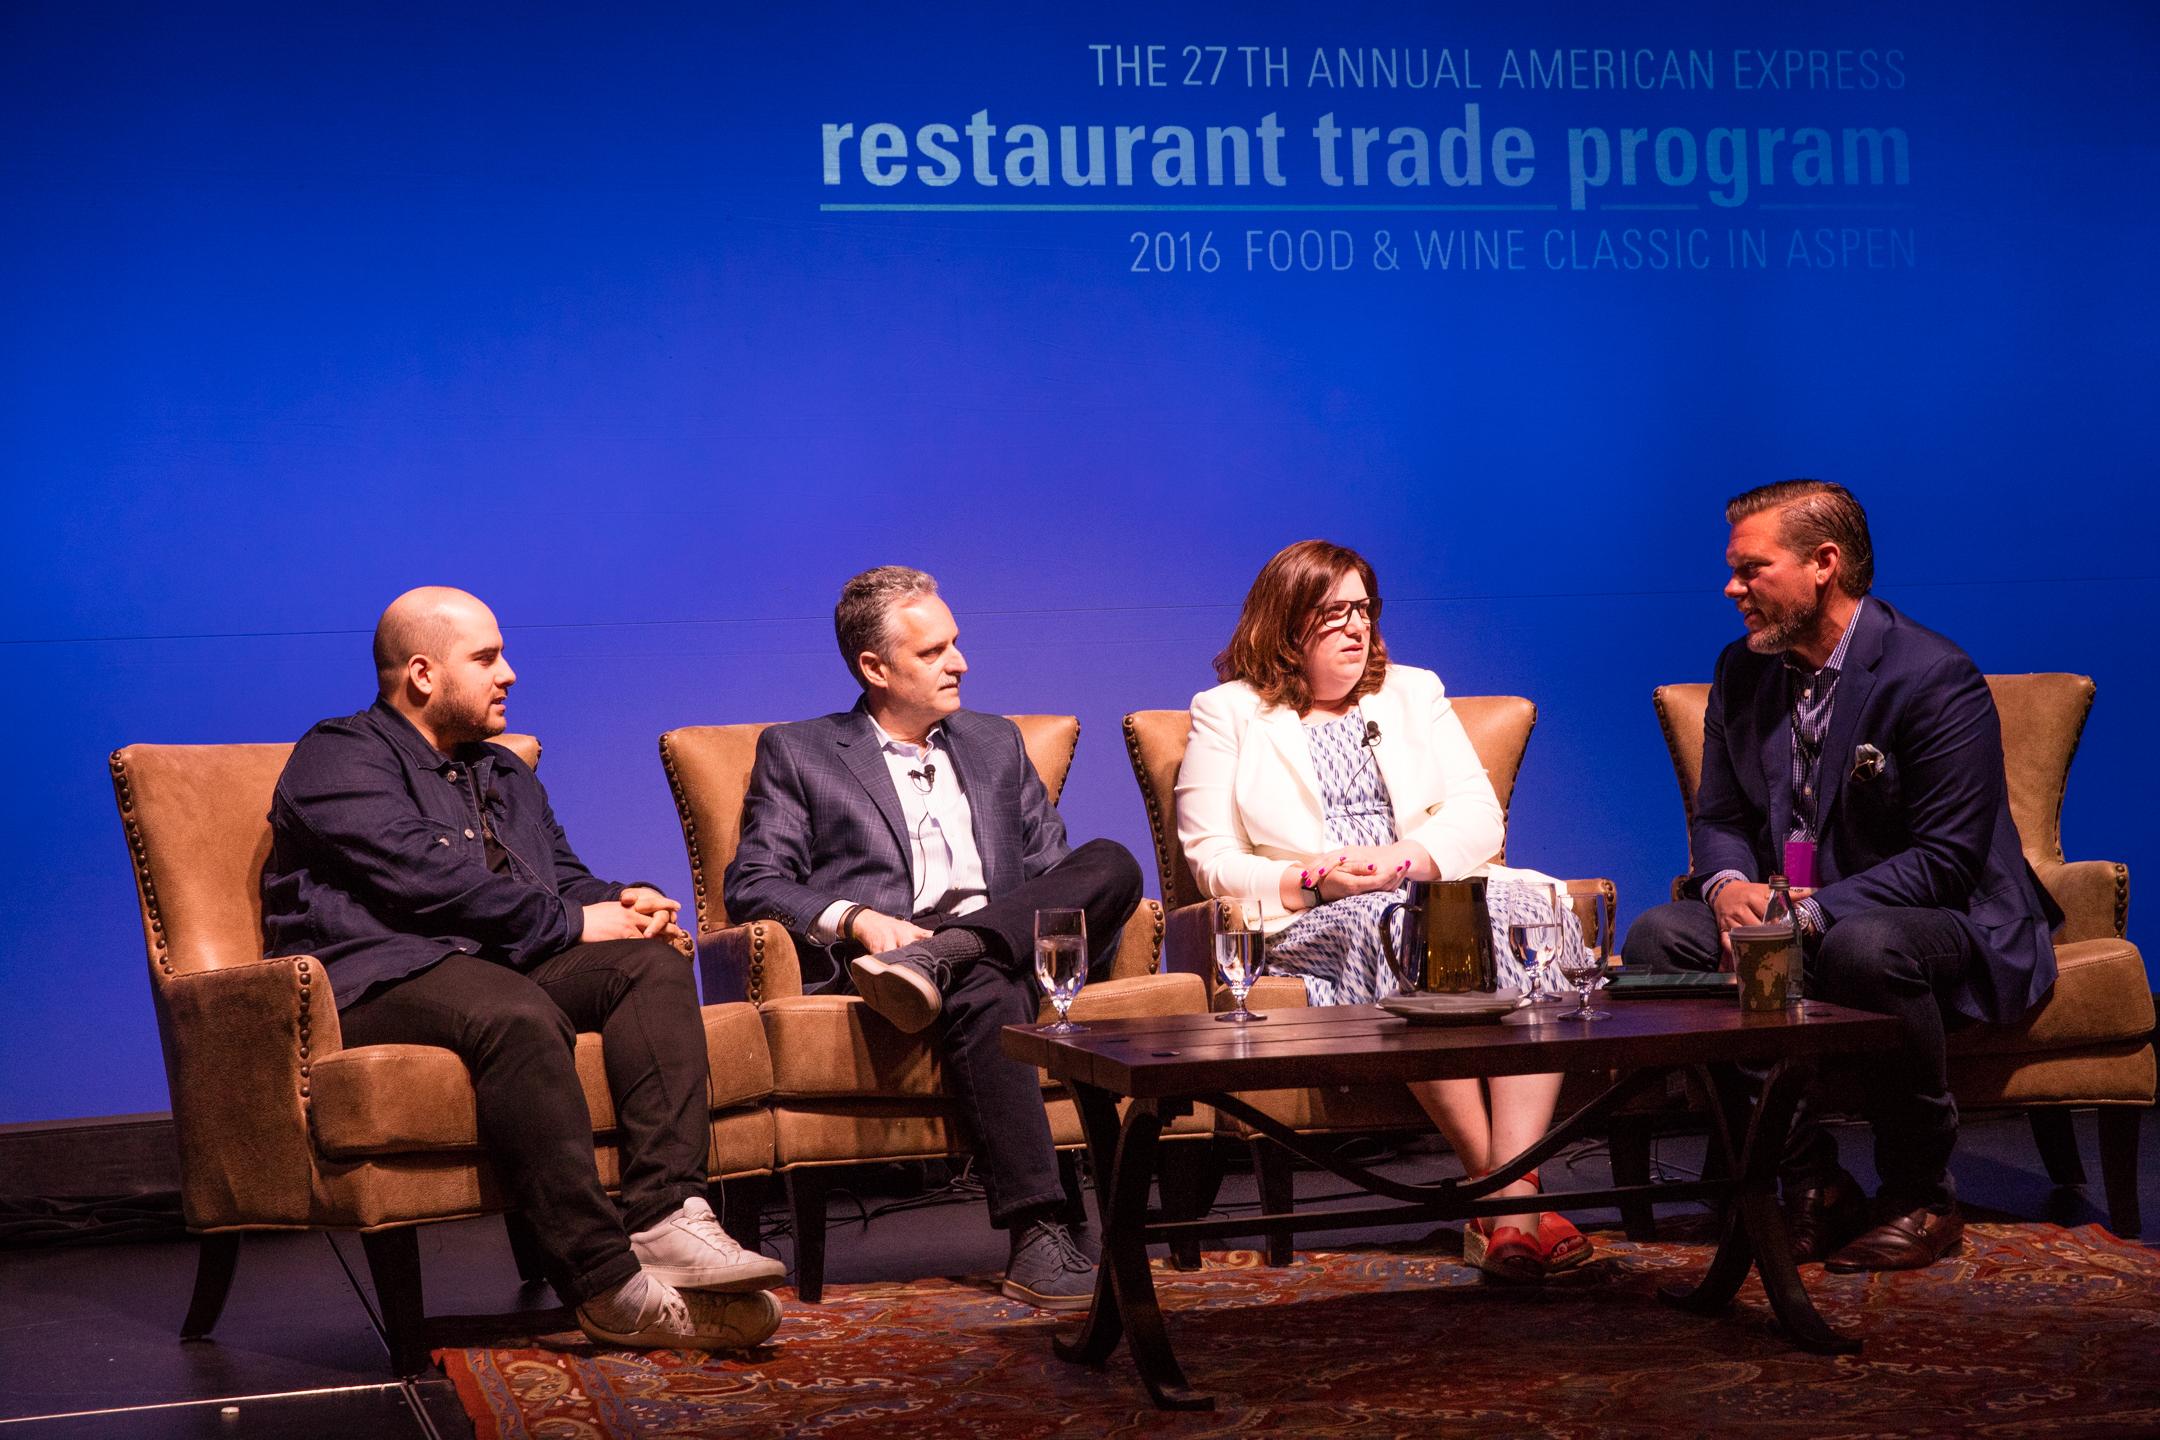 American Express Restaurant Trade Program, June 18